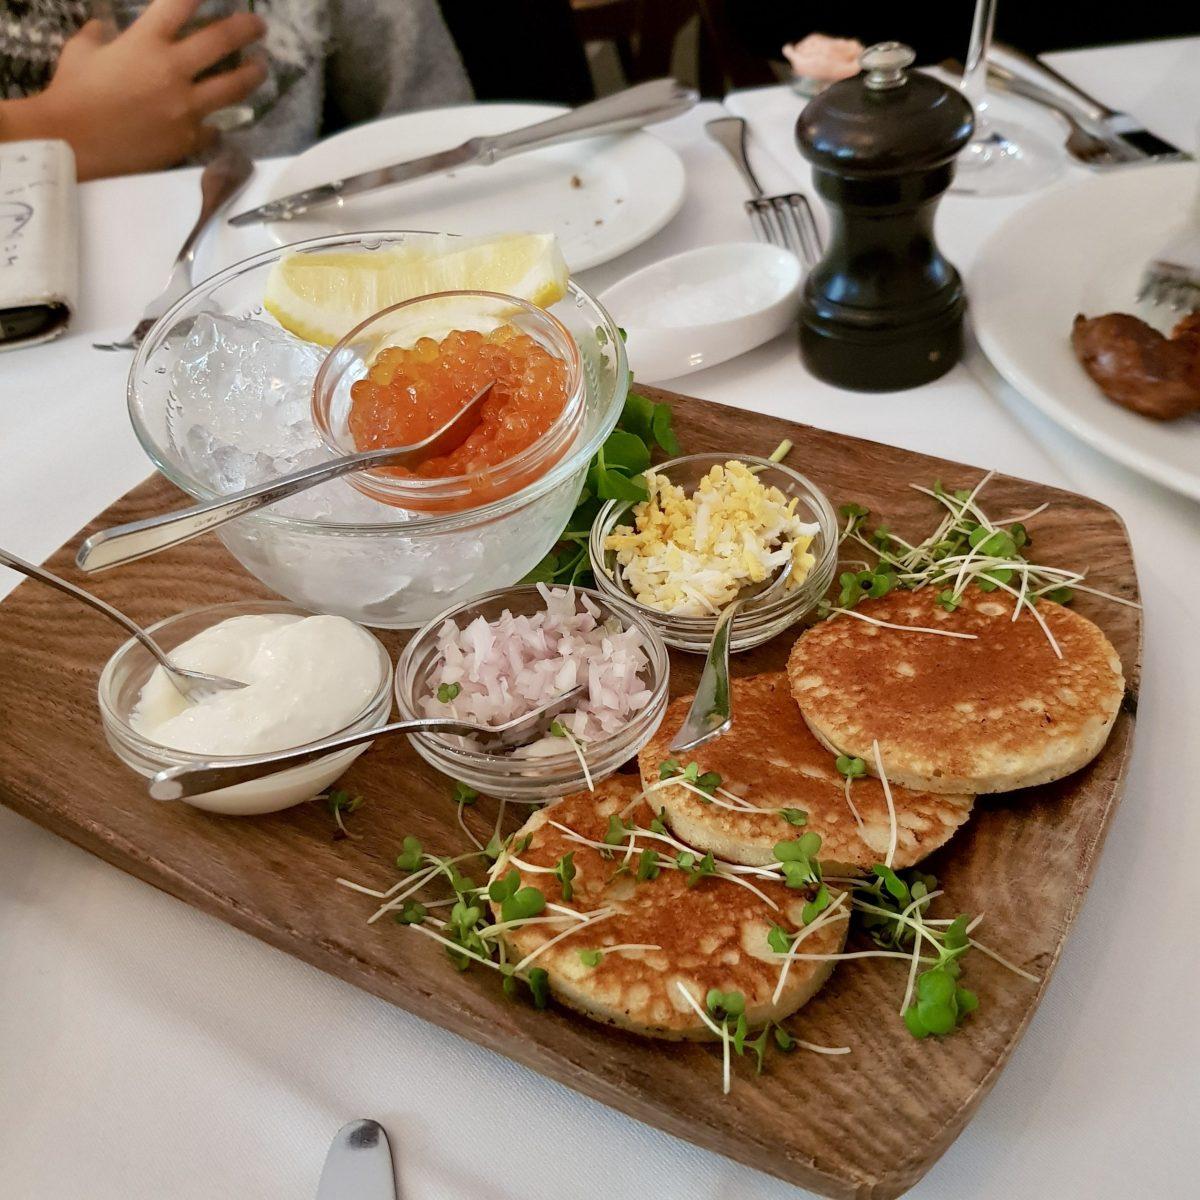 Ognisko Restaurant Classy Polish Dining South Kensington London Traditional Vodka Outdoor Alfresco Garden View Keta Caviar Blinis